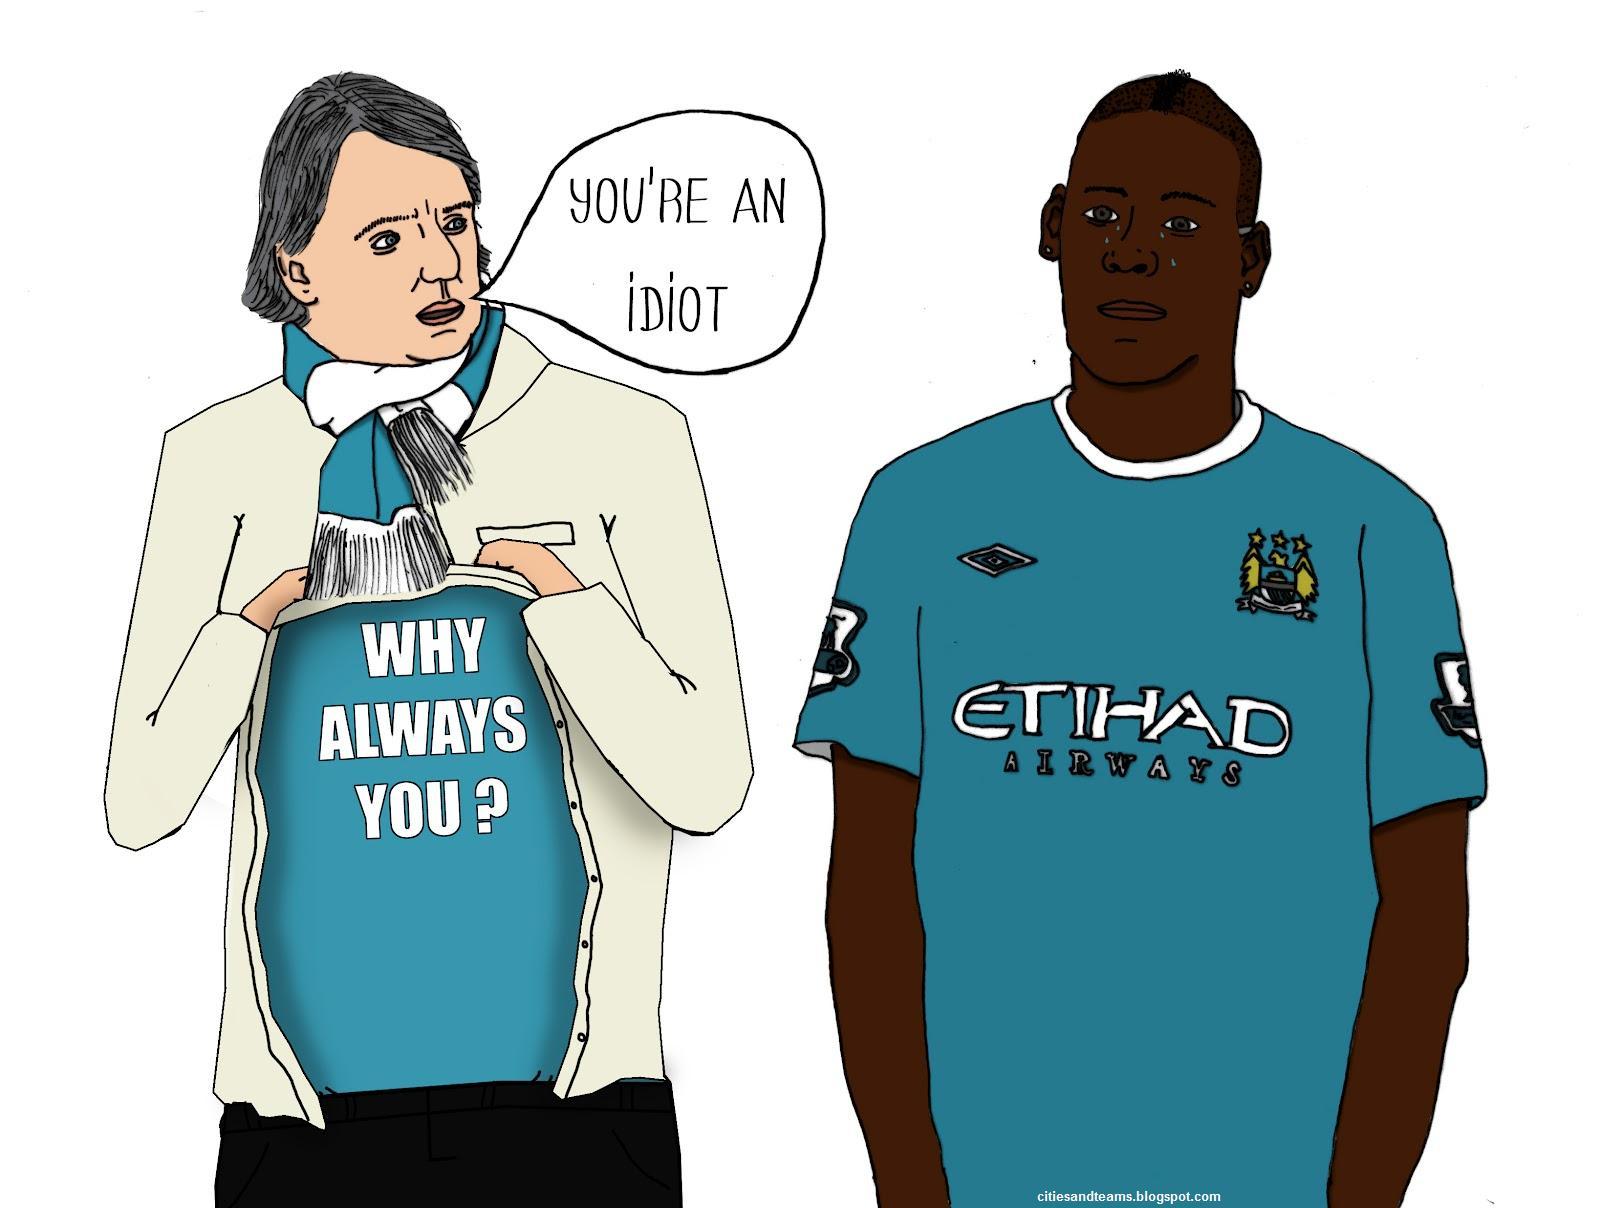 Man City Funny: Mario Balotelli Roberto Mancini Funny Cartoon Manchester